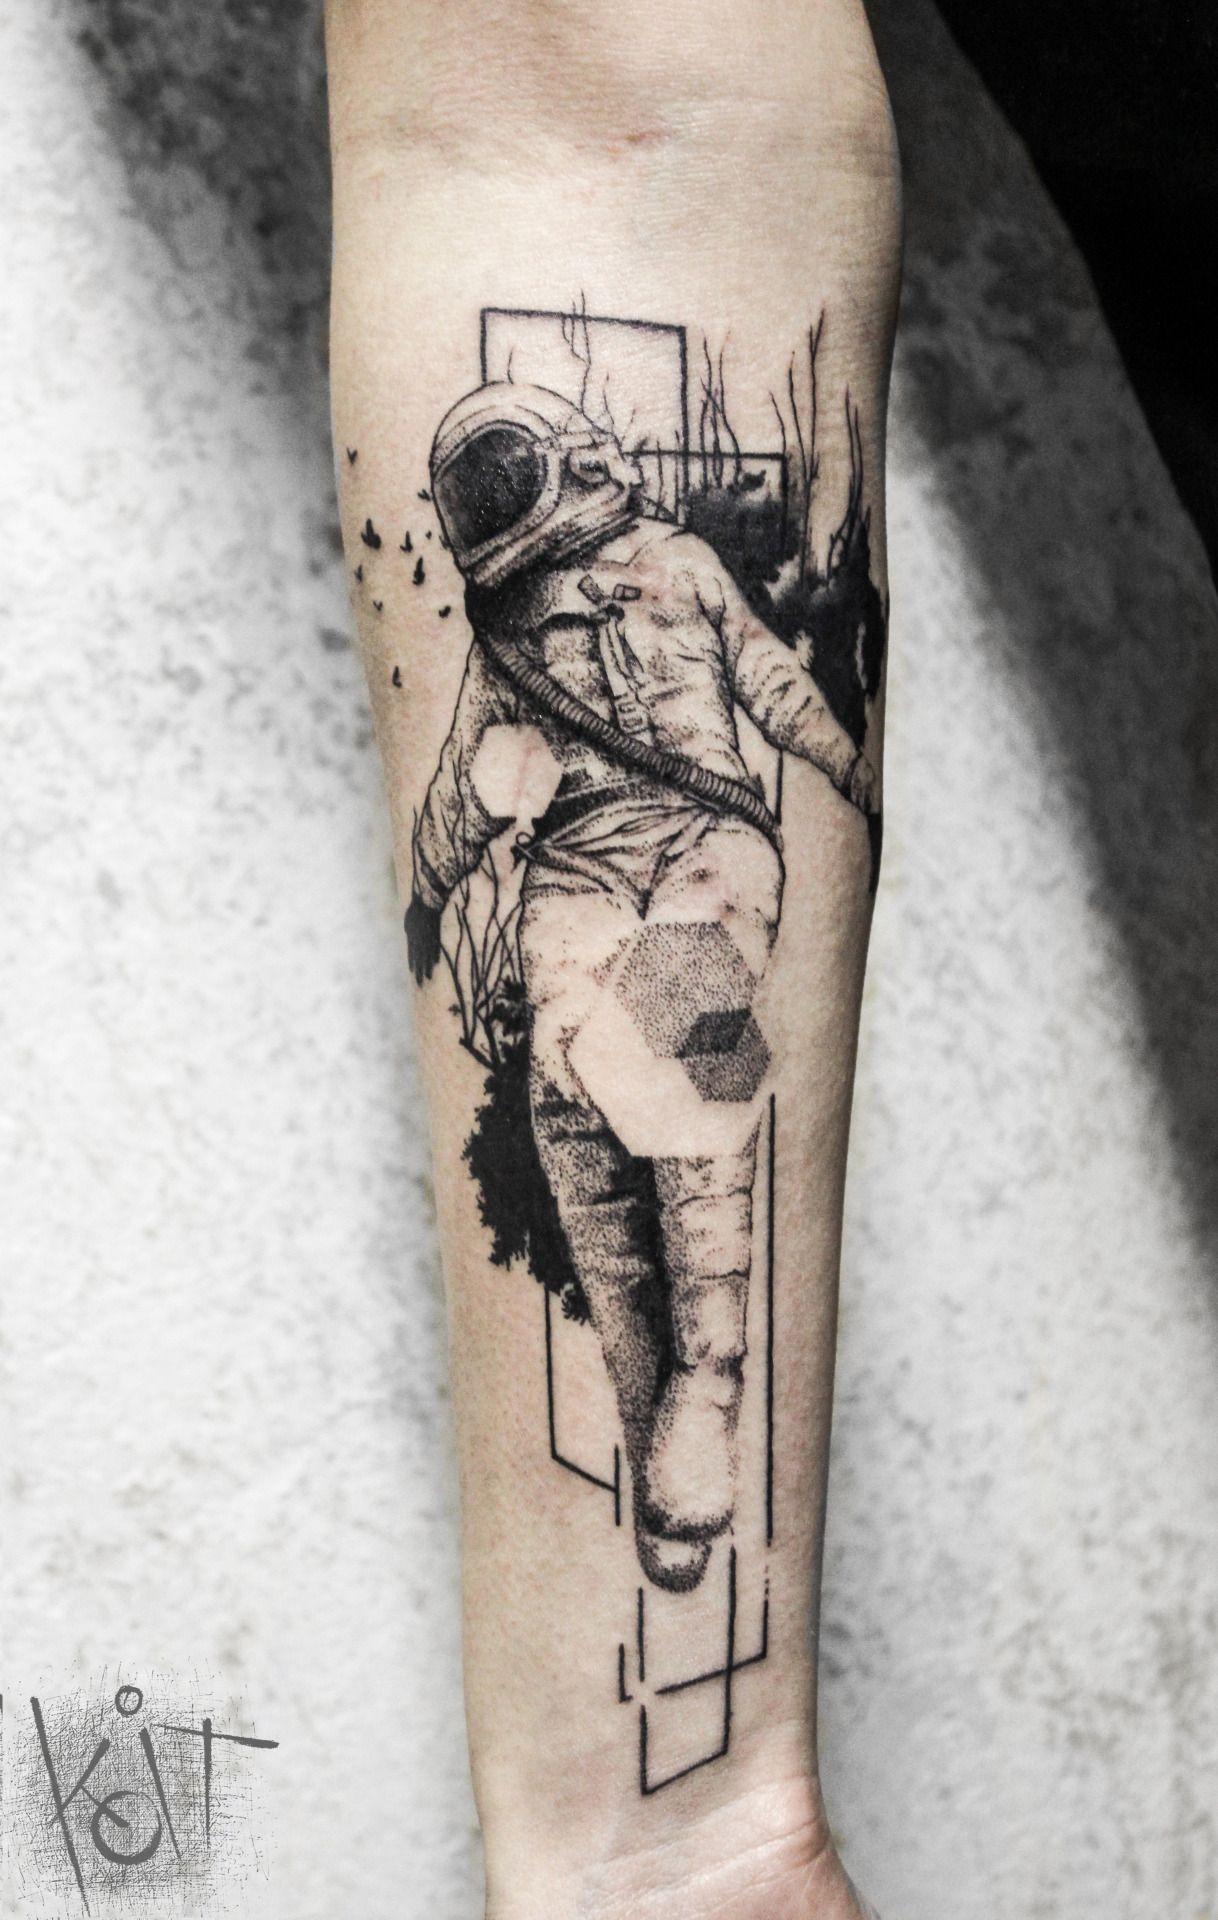 Astronaut Tattoo Ideas: Koit Tattoo // Berlin, Germany. Black Graphic Style